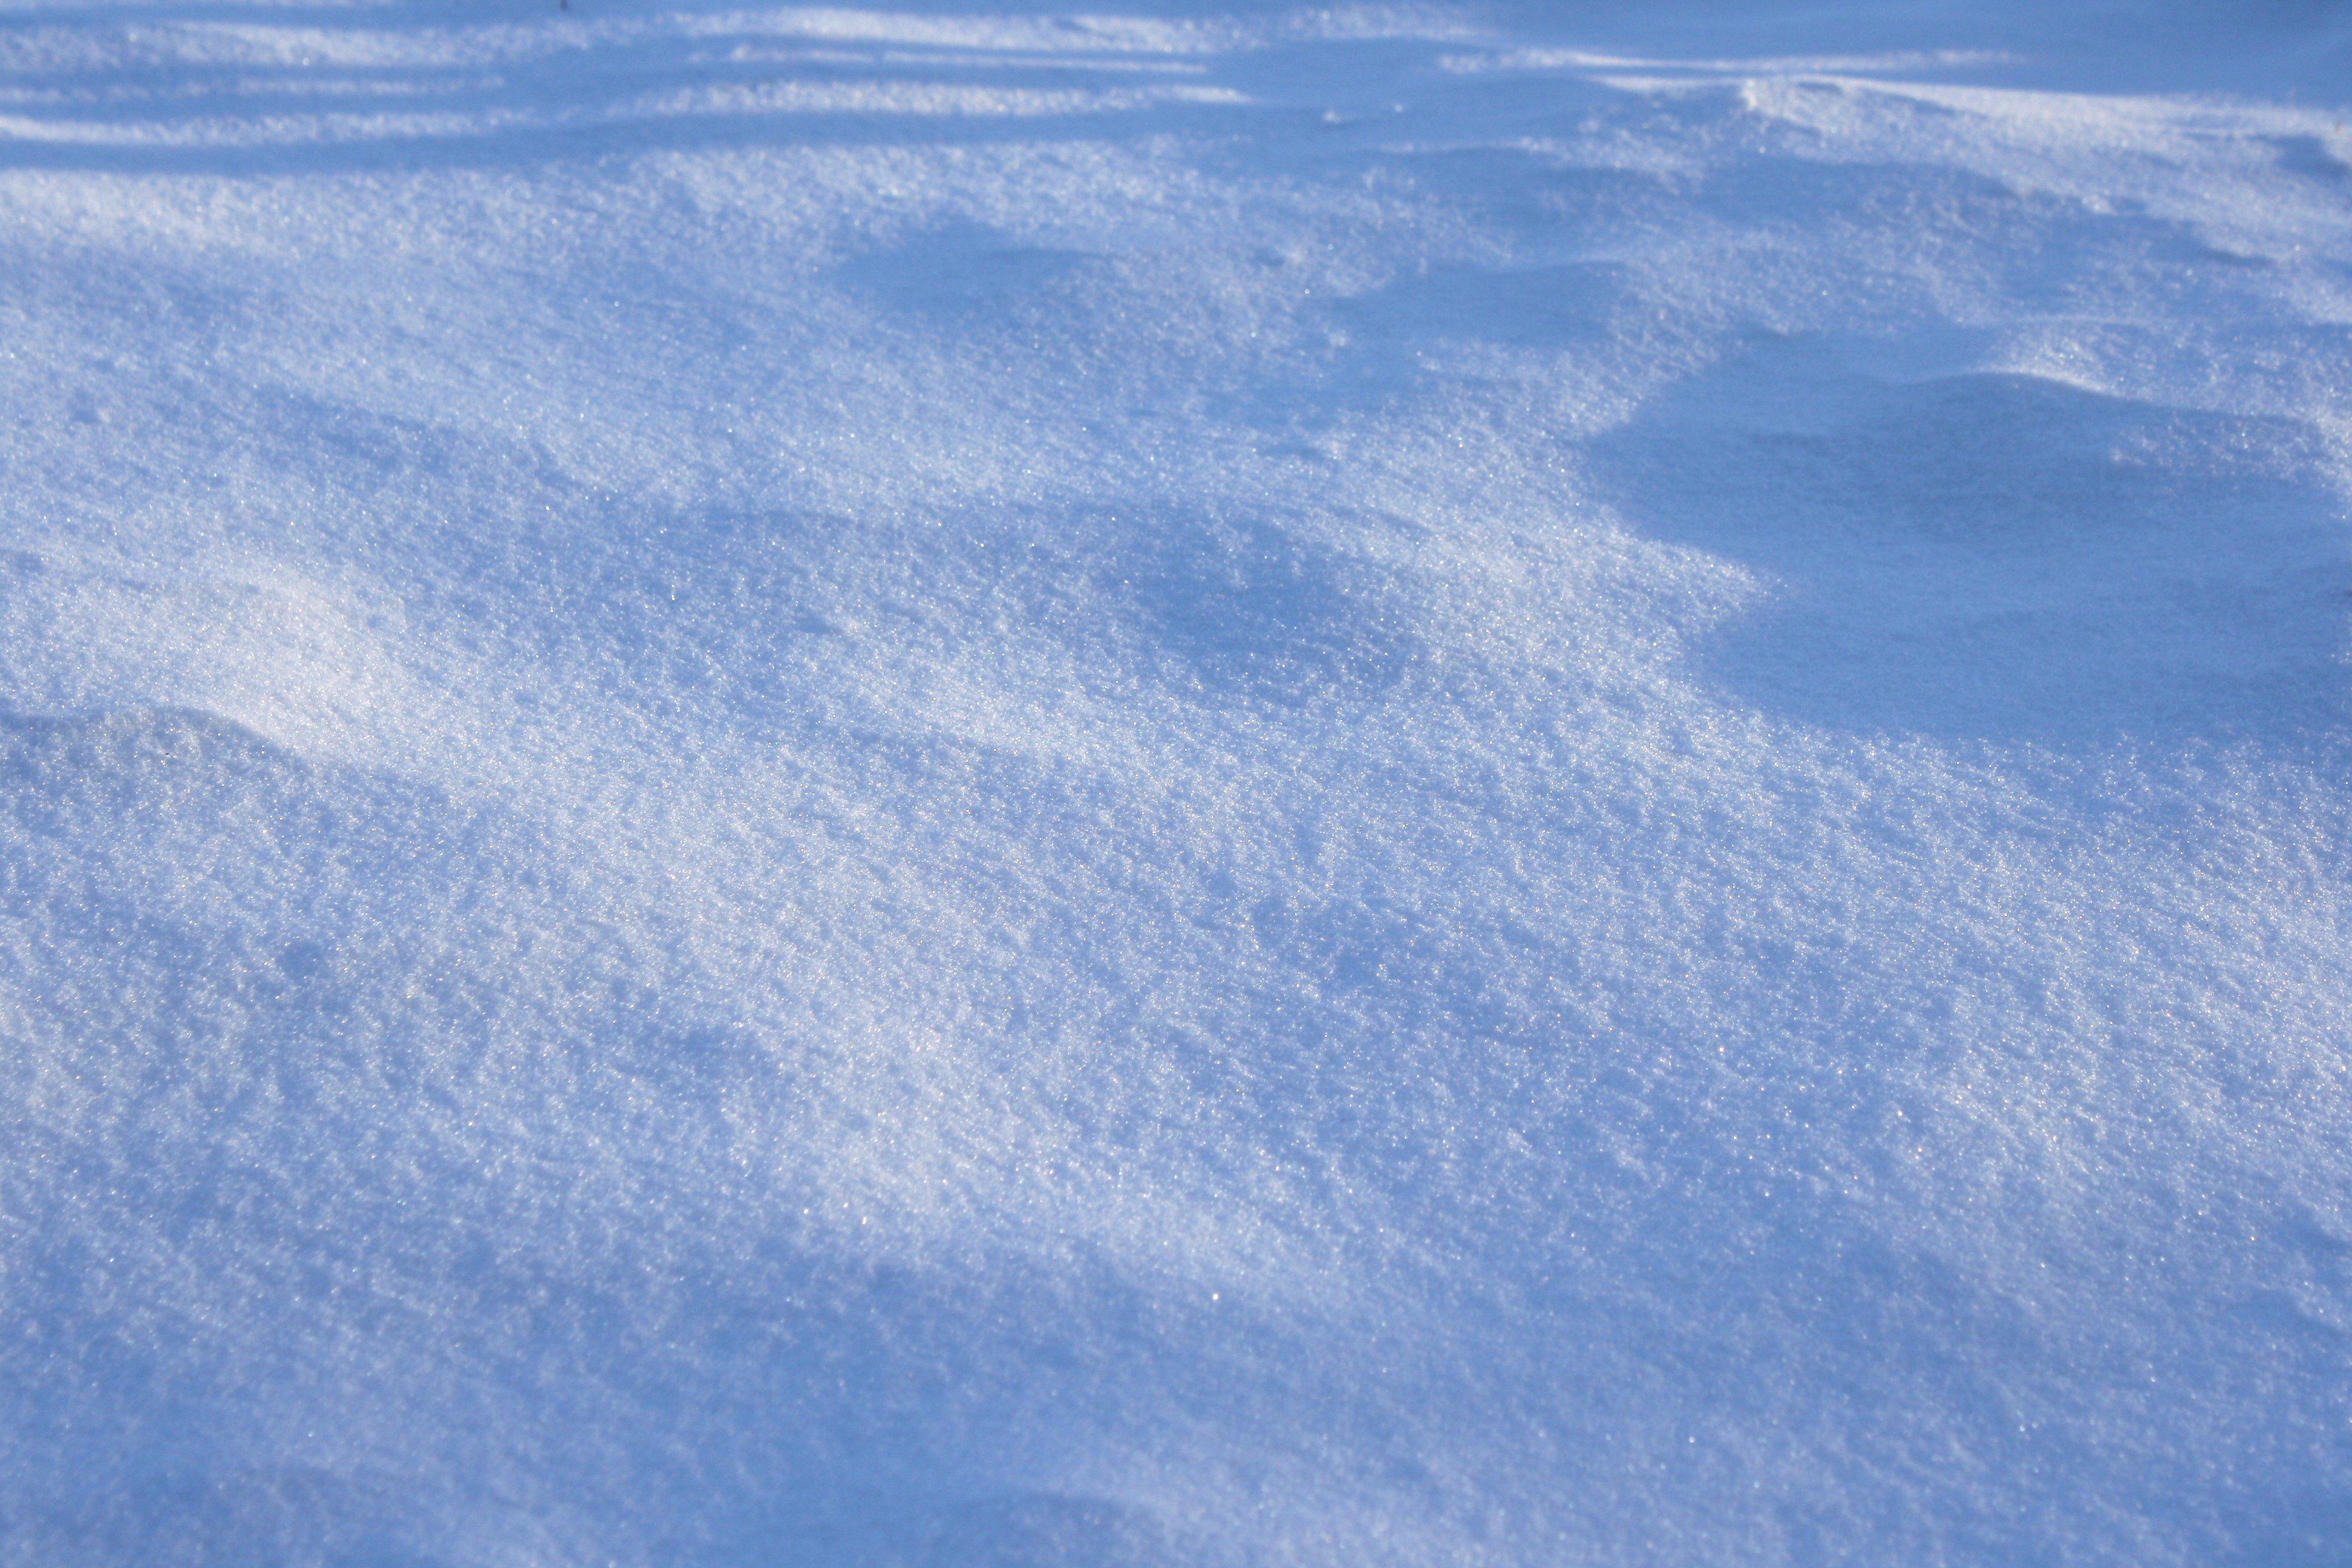 Shadows on Snow Texture Picture | Free Photograph | Photos Public Domain